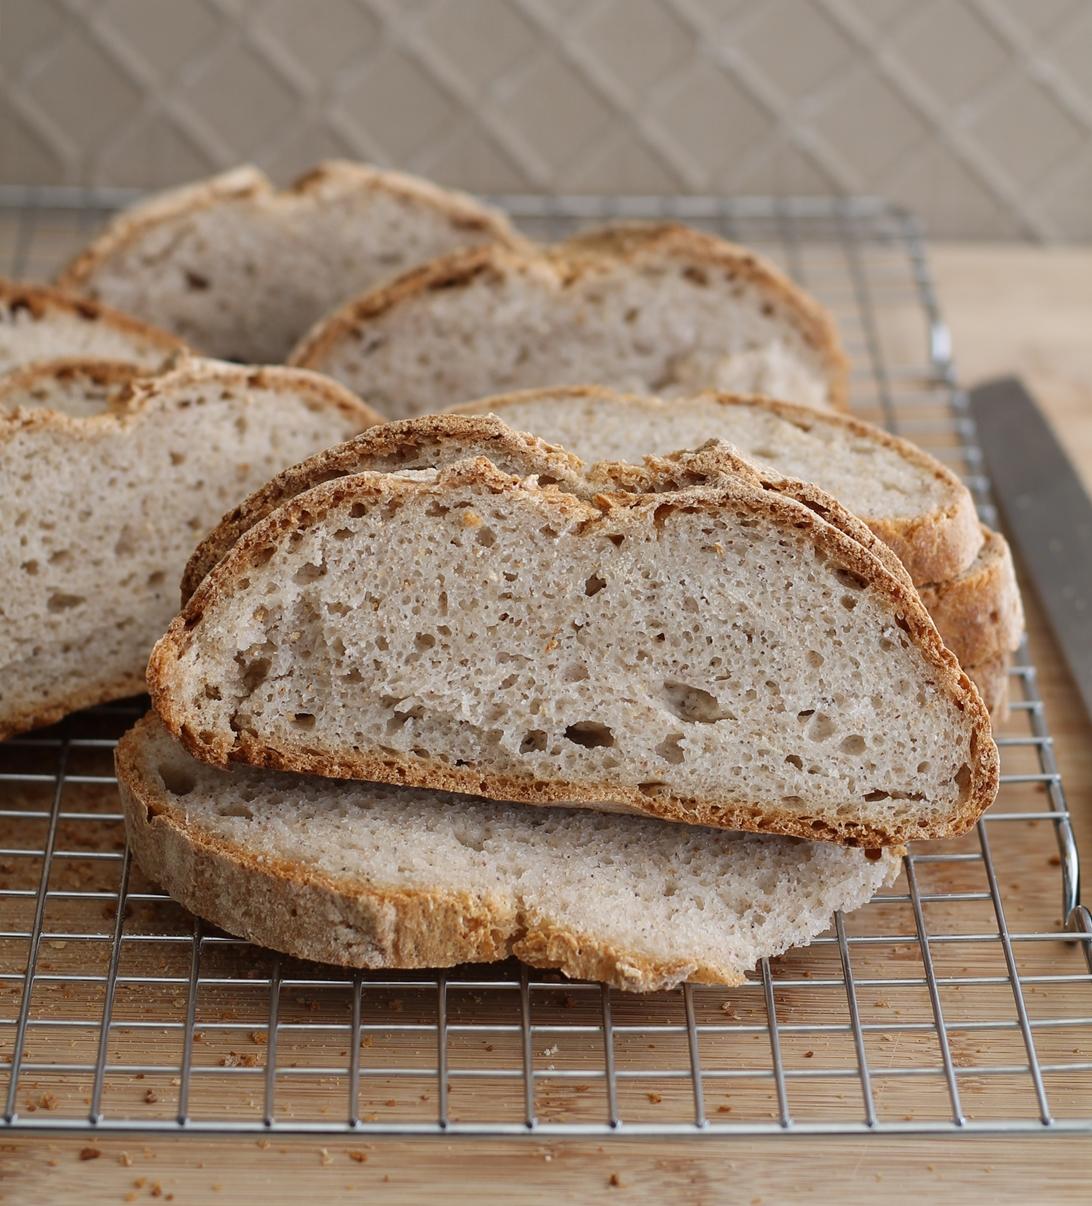 Pagnotta senza glutine al grano saraceno - La Cassata Celiaca